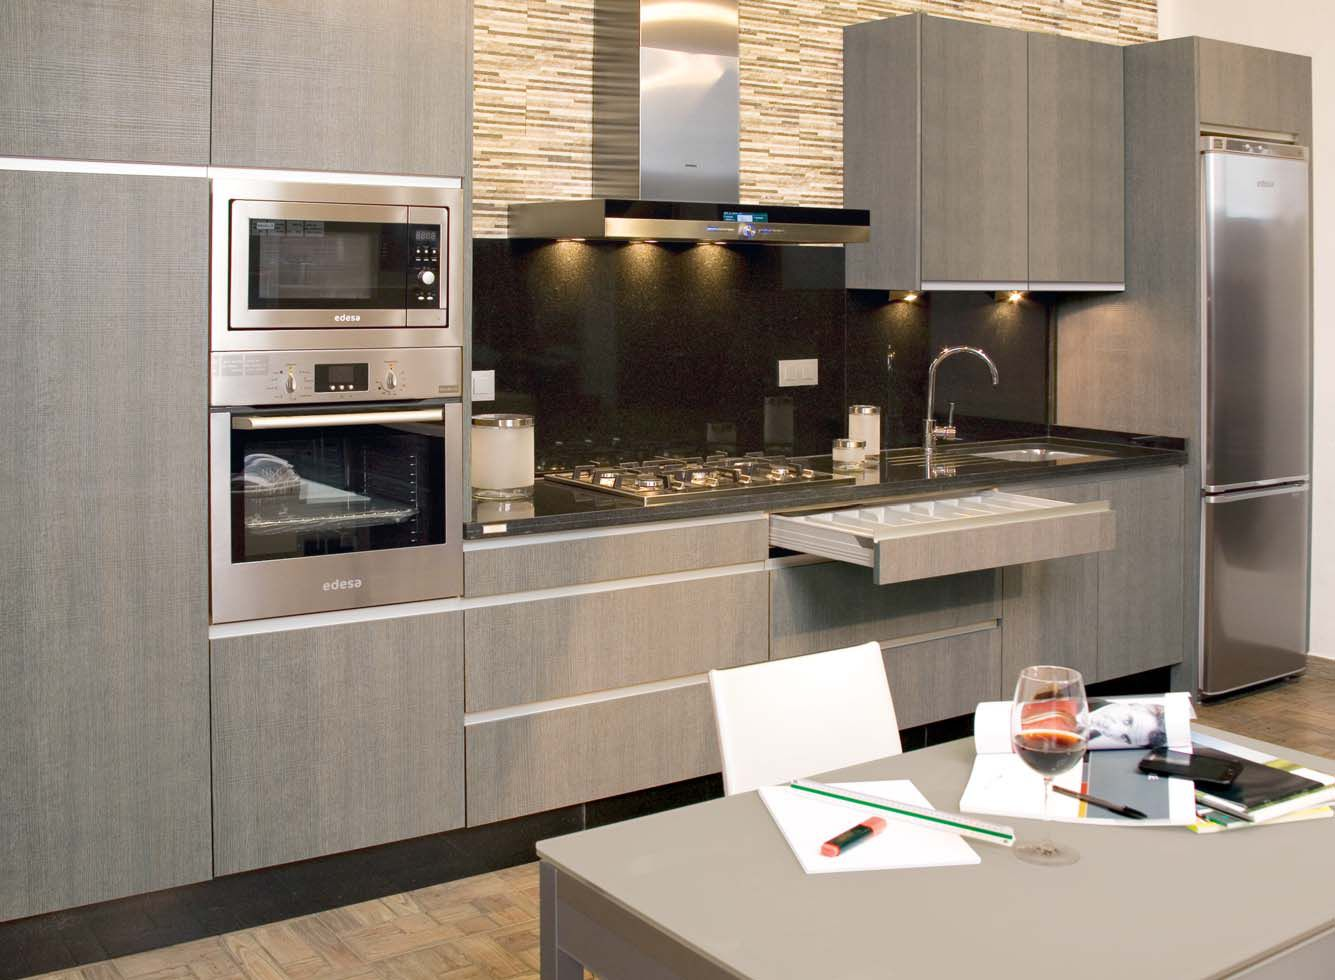 Cocina 76 cocinas capis dise o y fabricaci n de cocinas for Configurador de cocinas